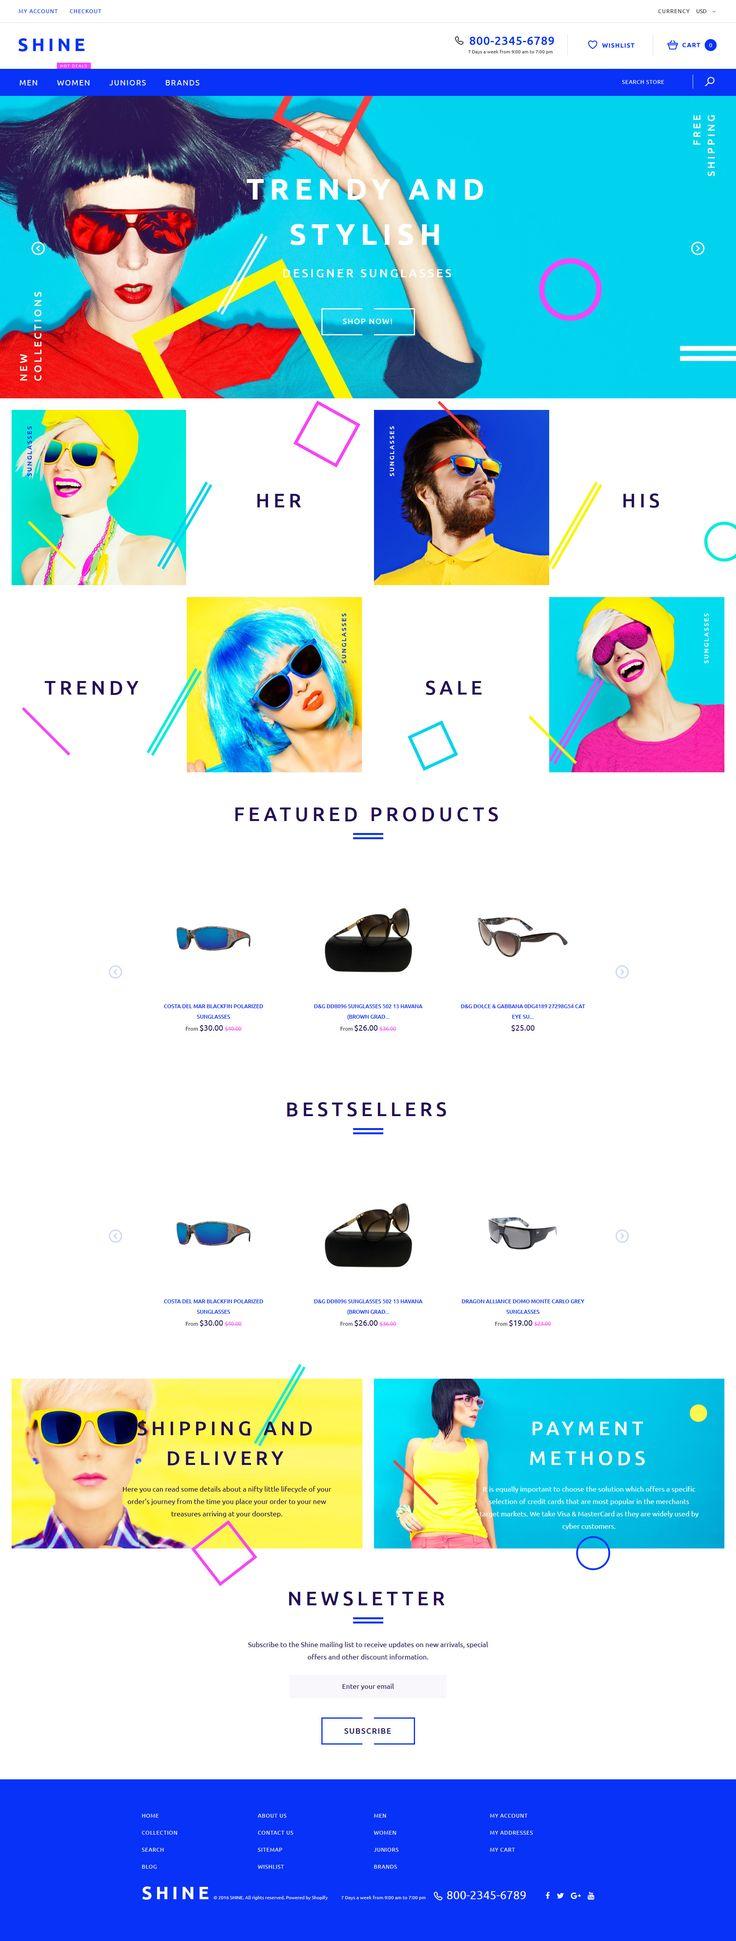 Shine Shopify Theme - http://www.templatemonster.com/shopify-themes/shine-shopify-theme-60057.html